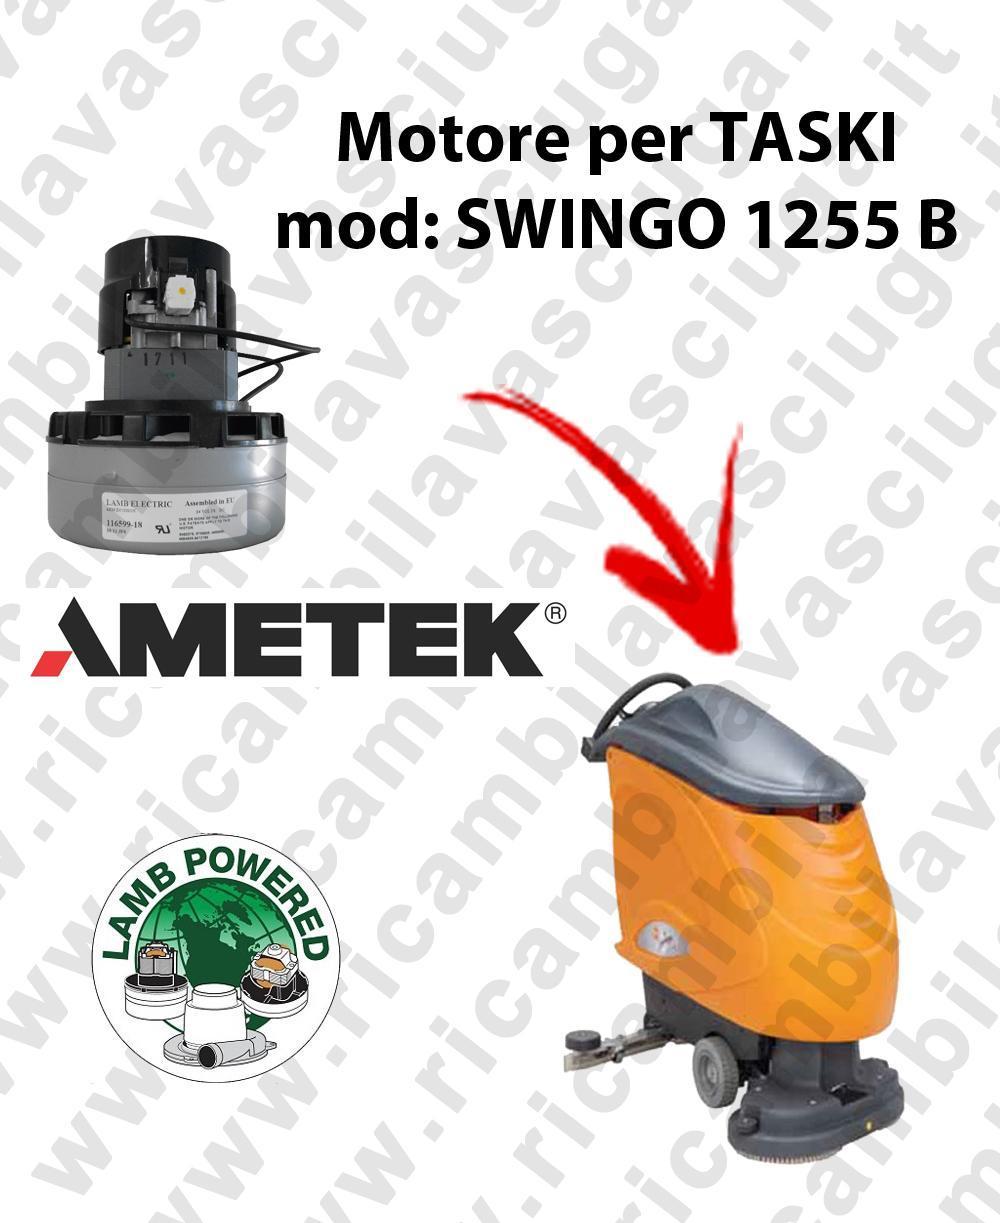 SWINGO 1255 B Saugmotor LAMB AMETEK für scheuersaugmaschinen TASKI